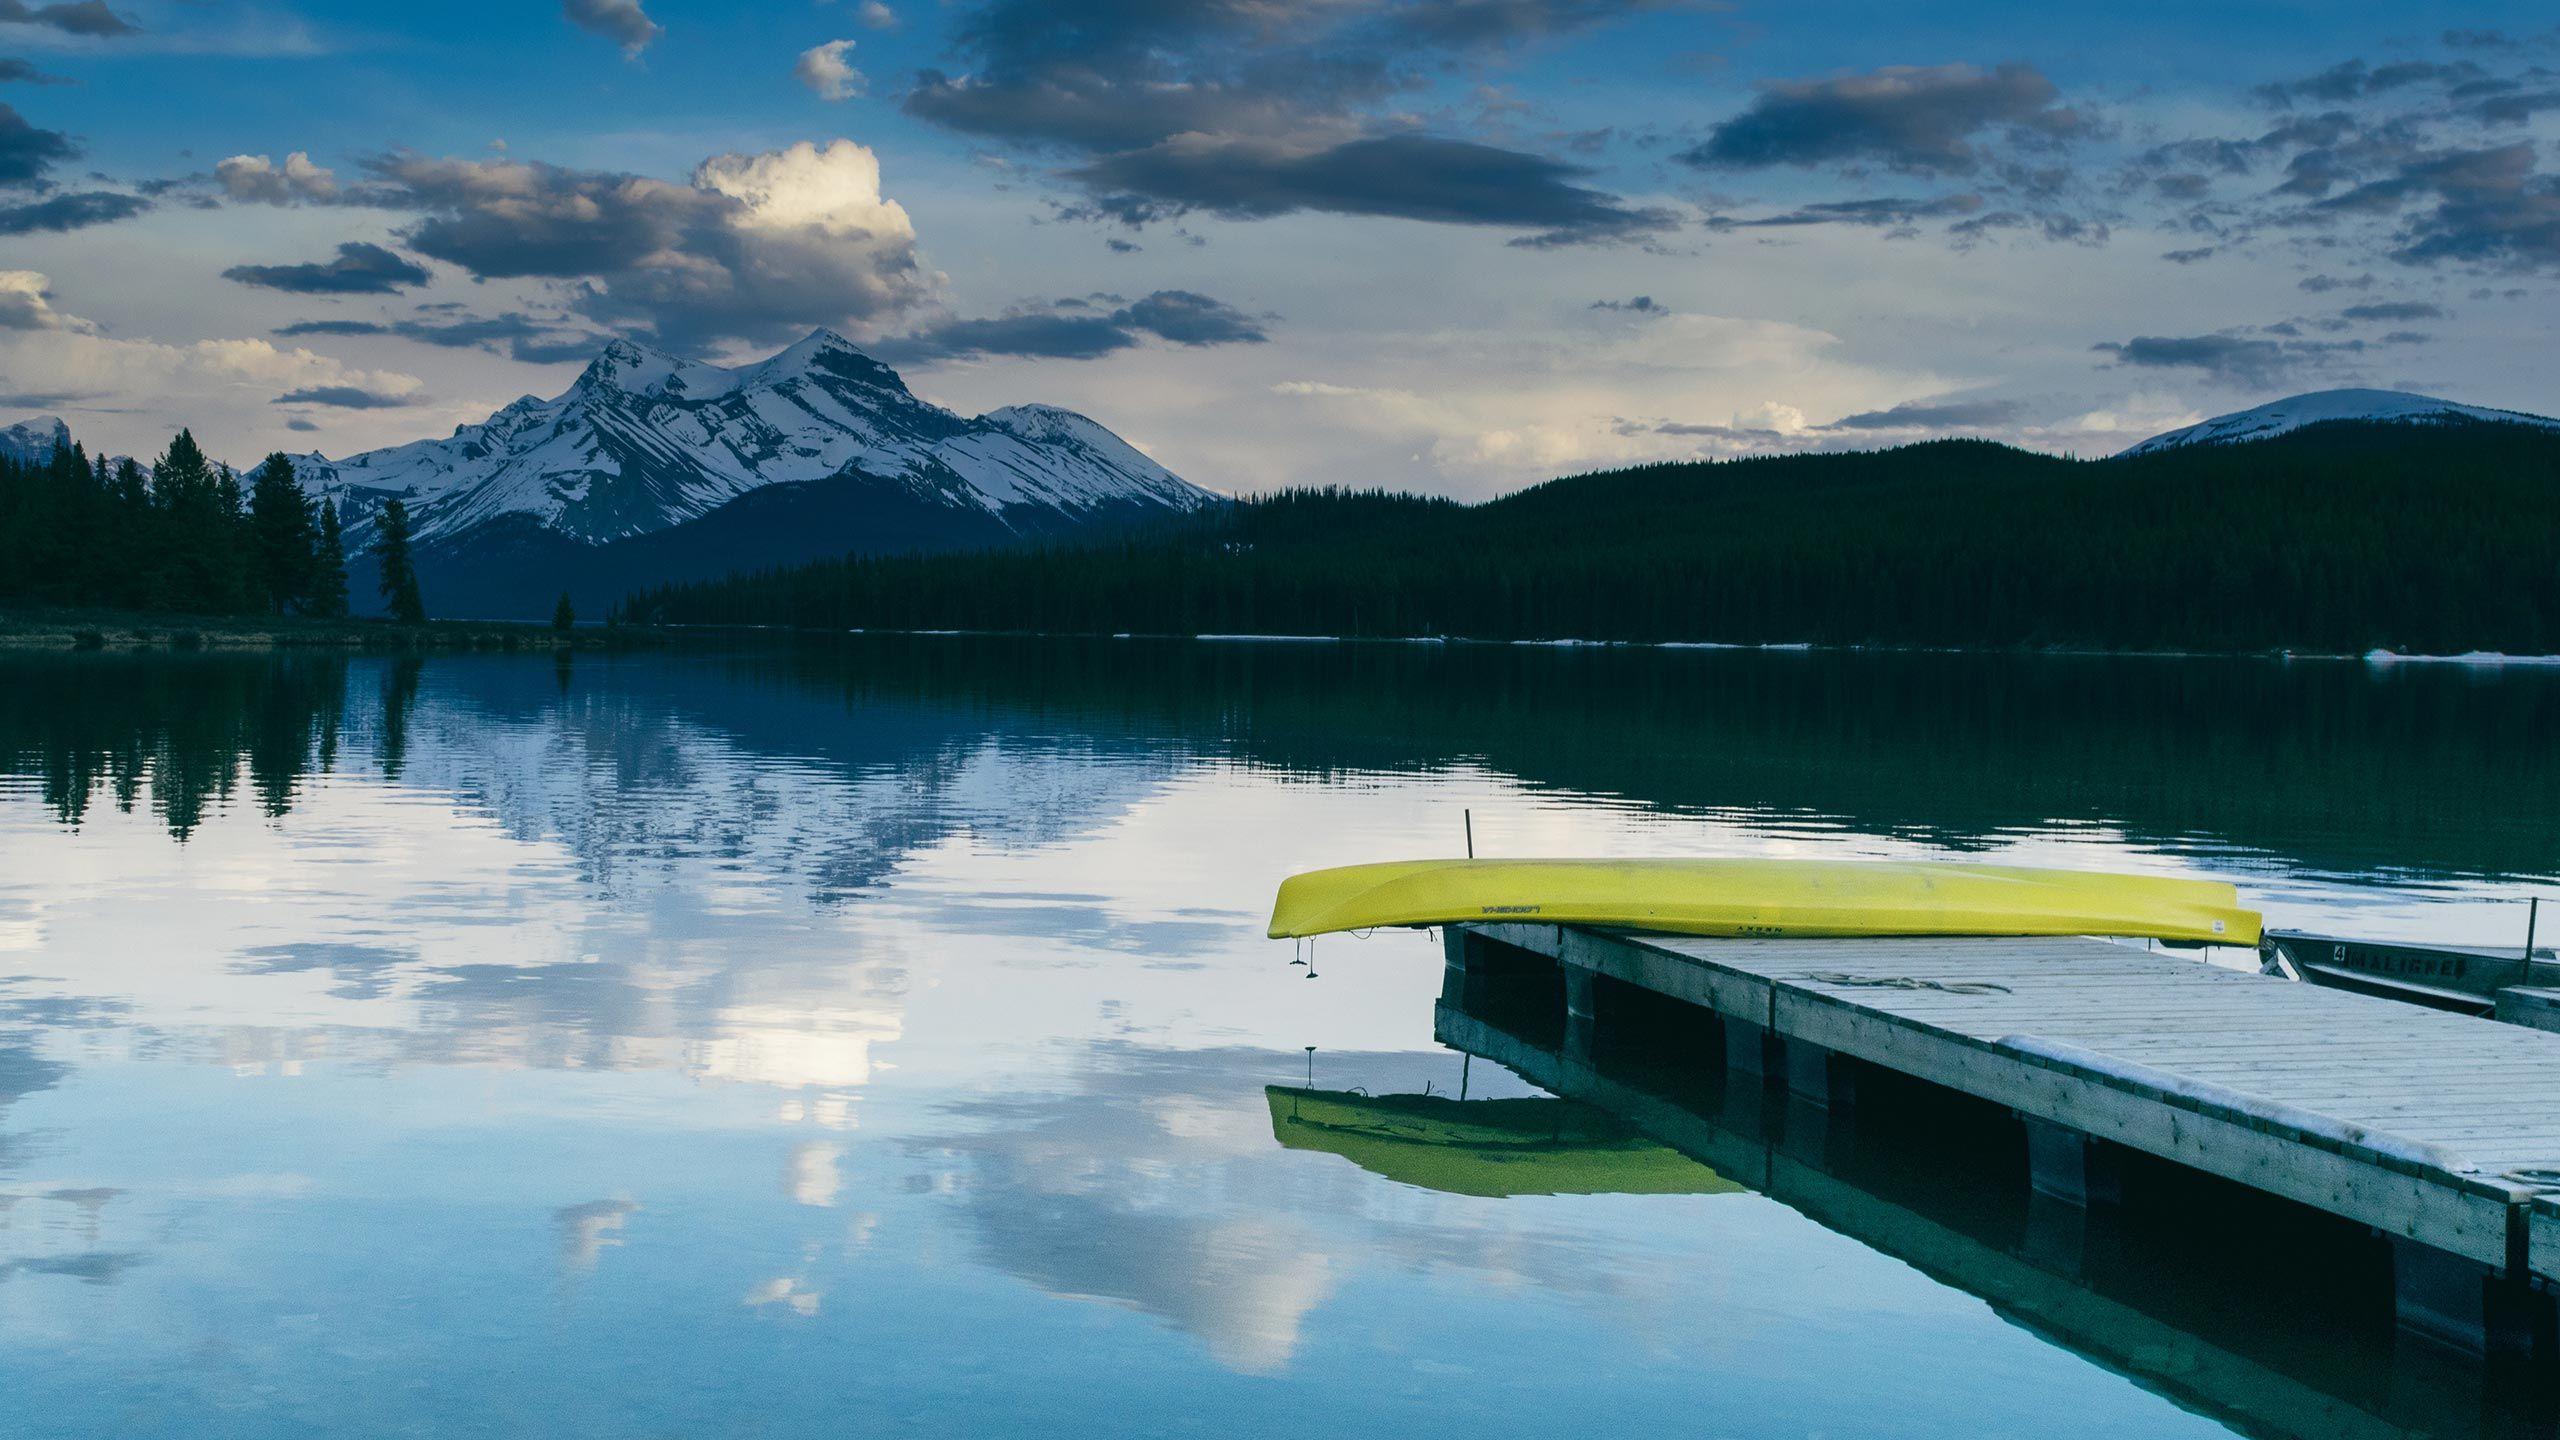 Lake_2560x1440.jpg